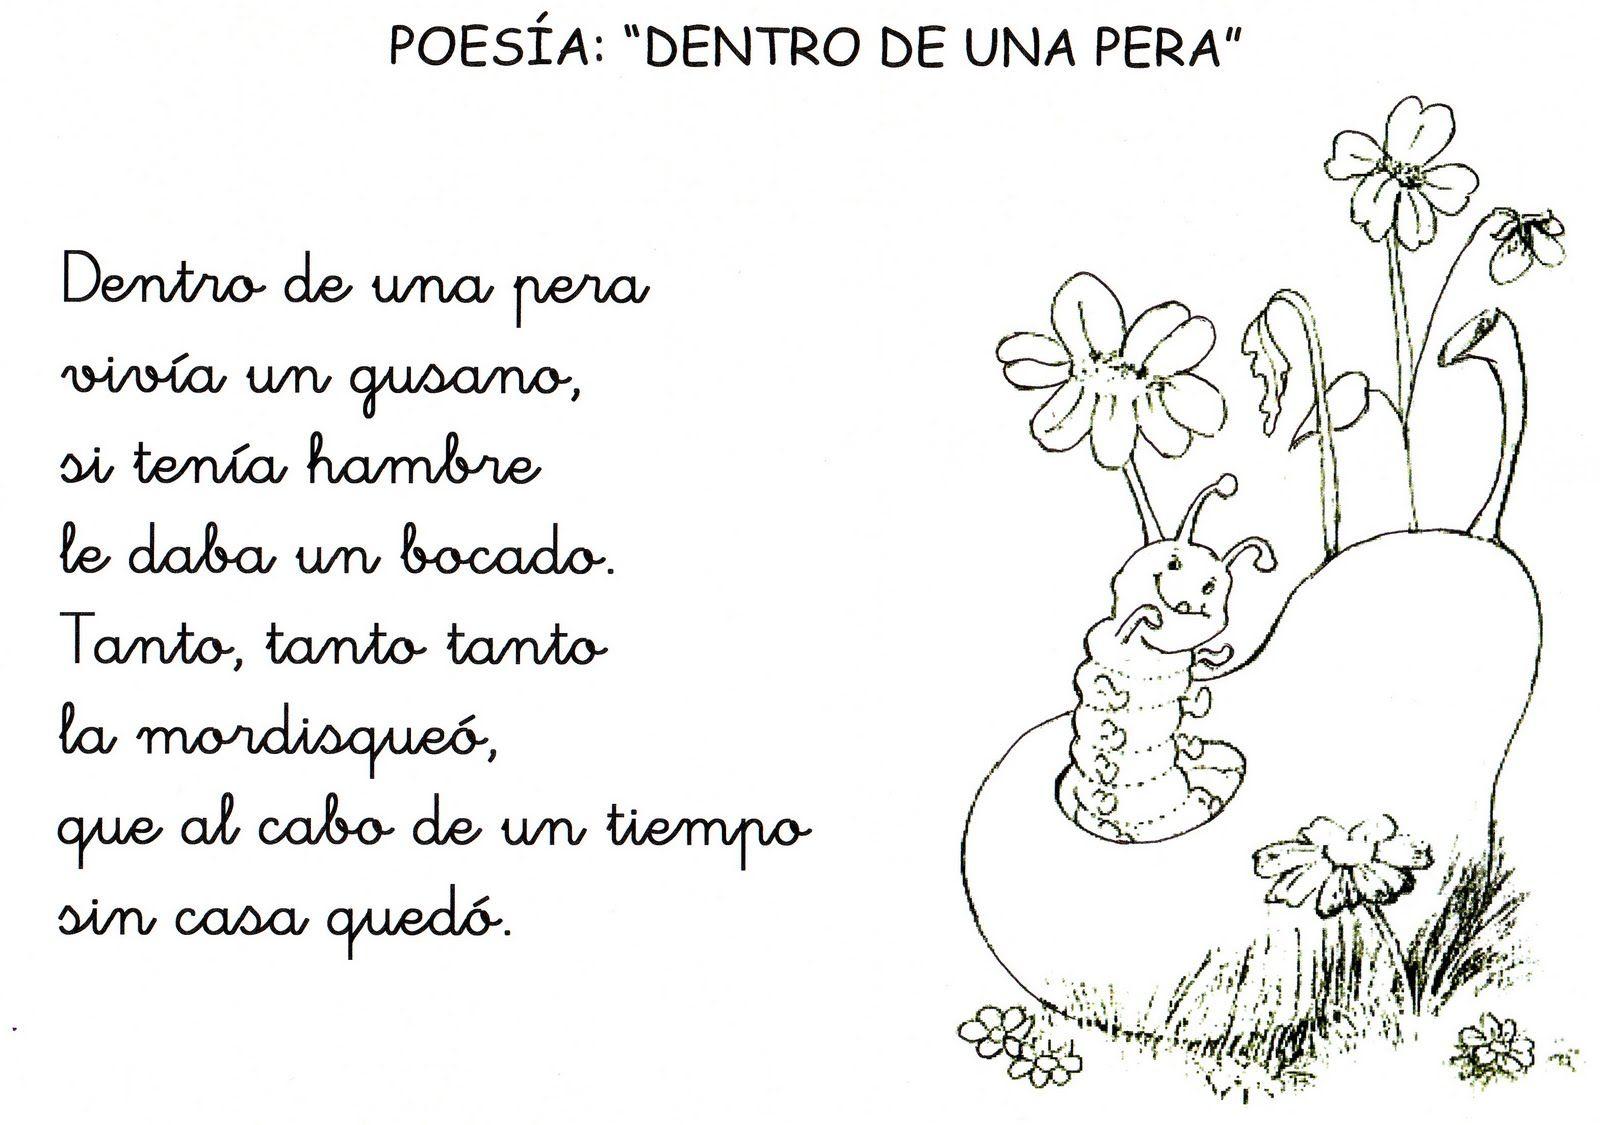 Lenguaje Oral En Ed Infantil Poesia Dentro De Una Pera Poesias Infantiles Poemas Infantiles Poemas Para Ninos